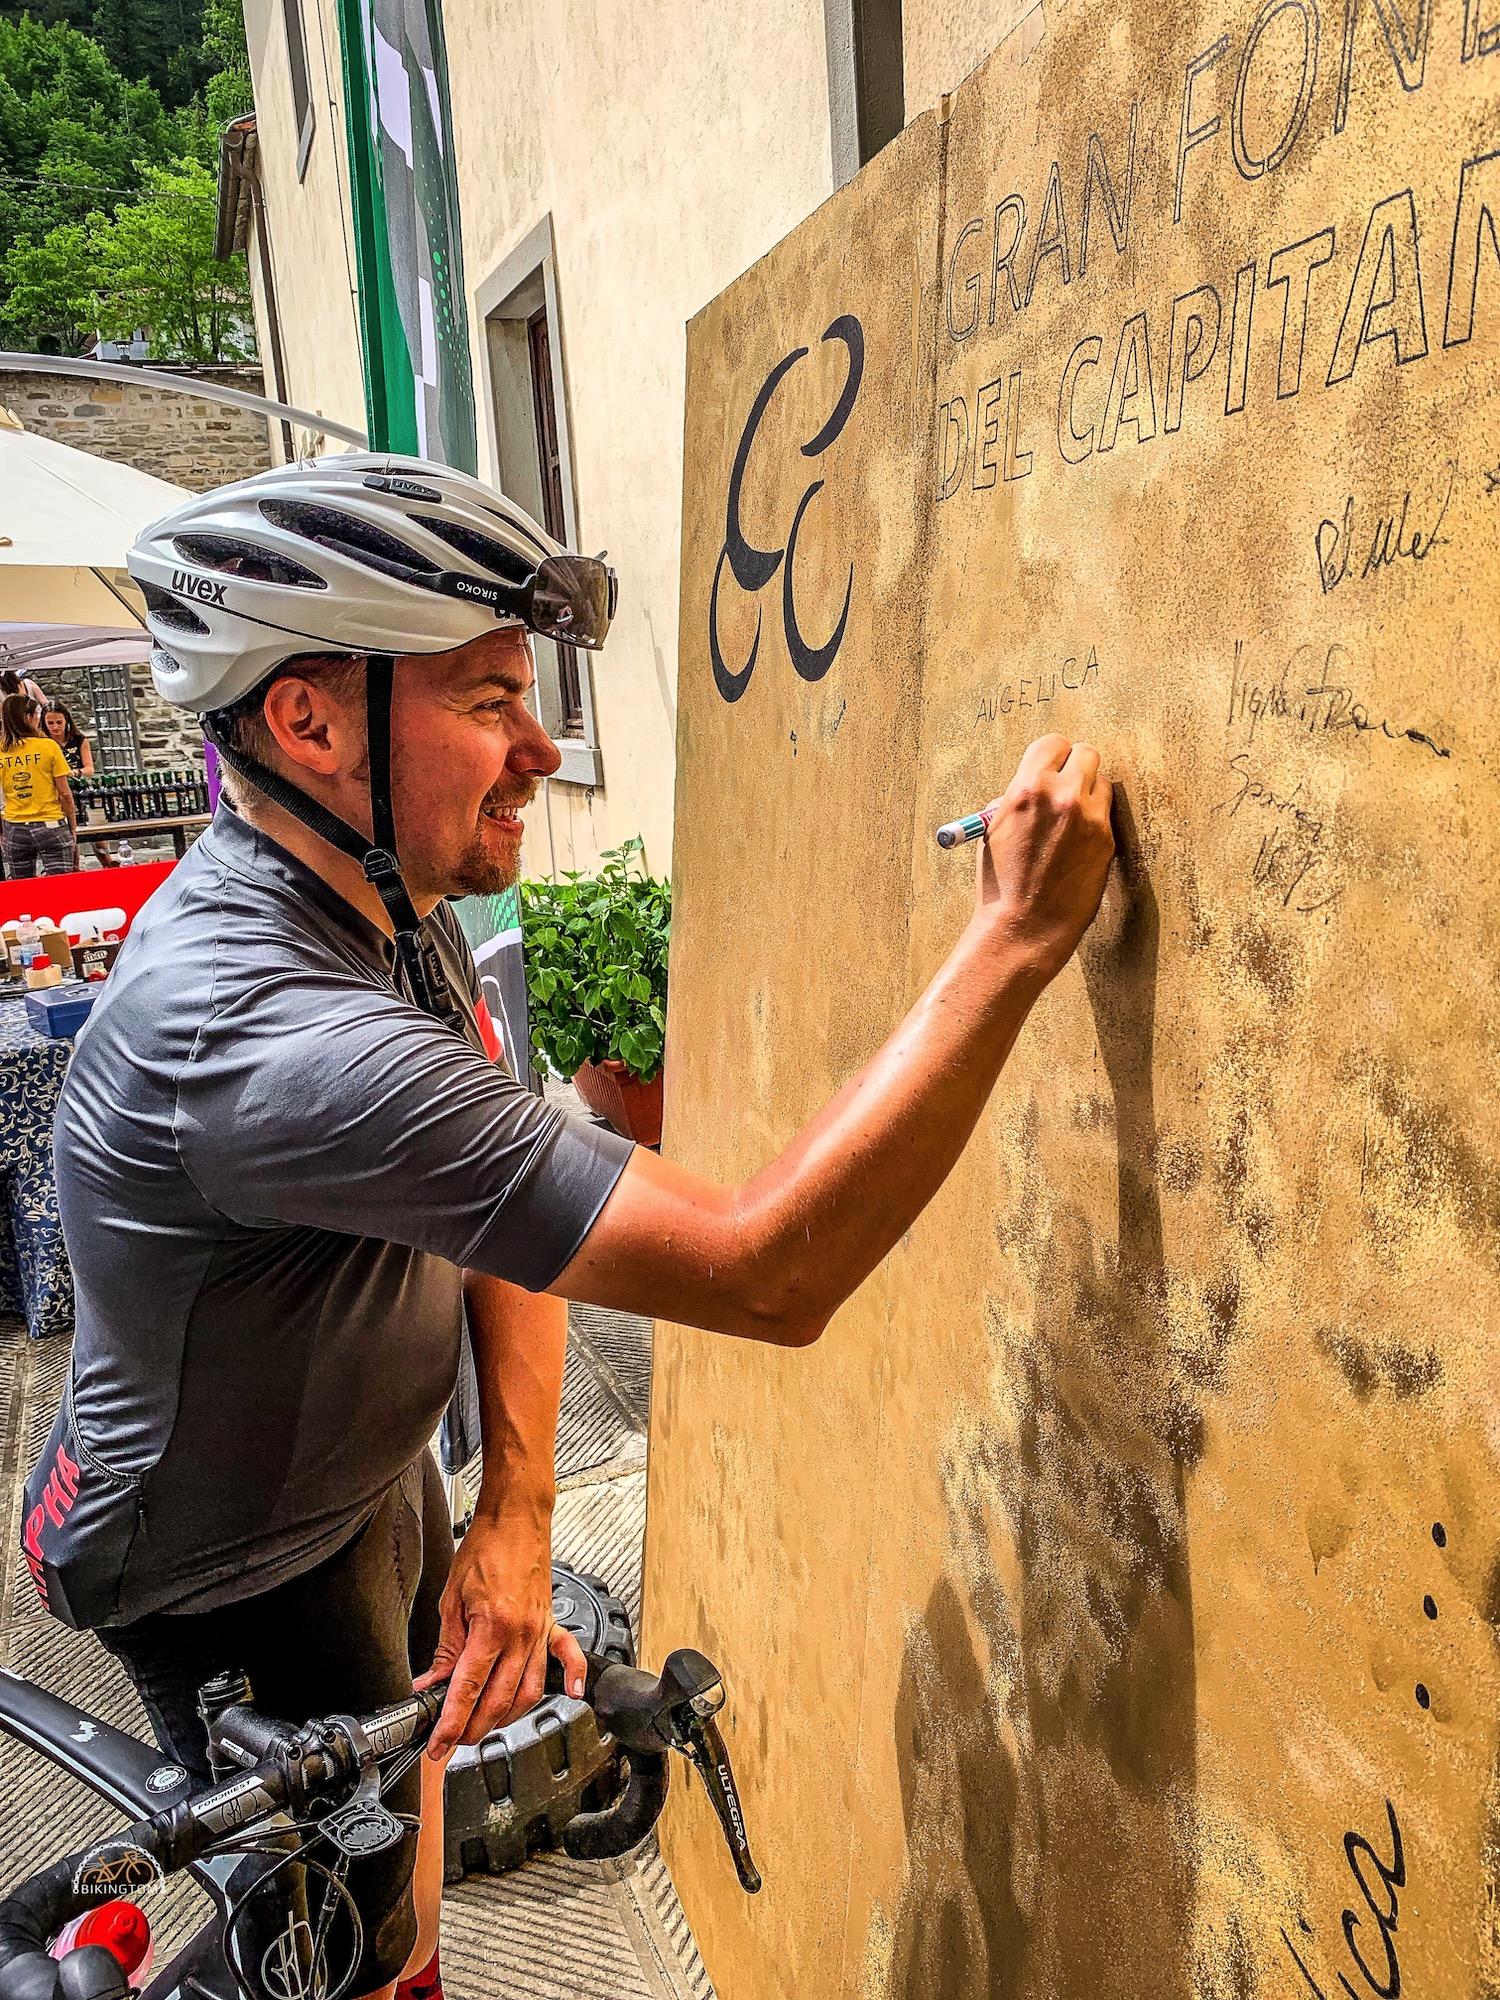 Emilia Romagna,Cycling,Fahrrad,Italien,bikingtom,Gran Fondo Del Capitano